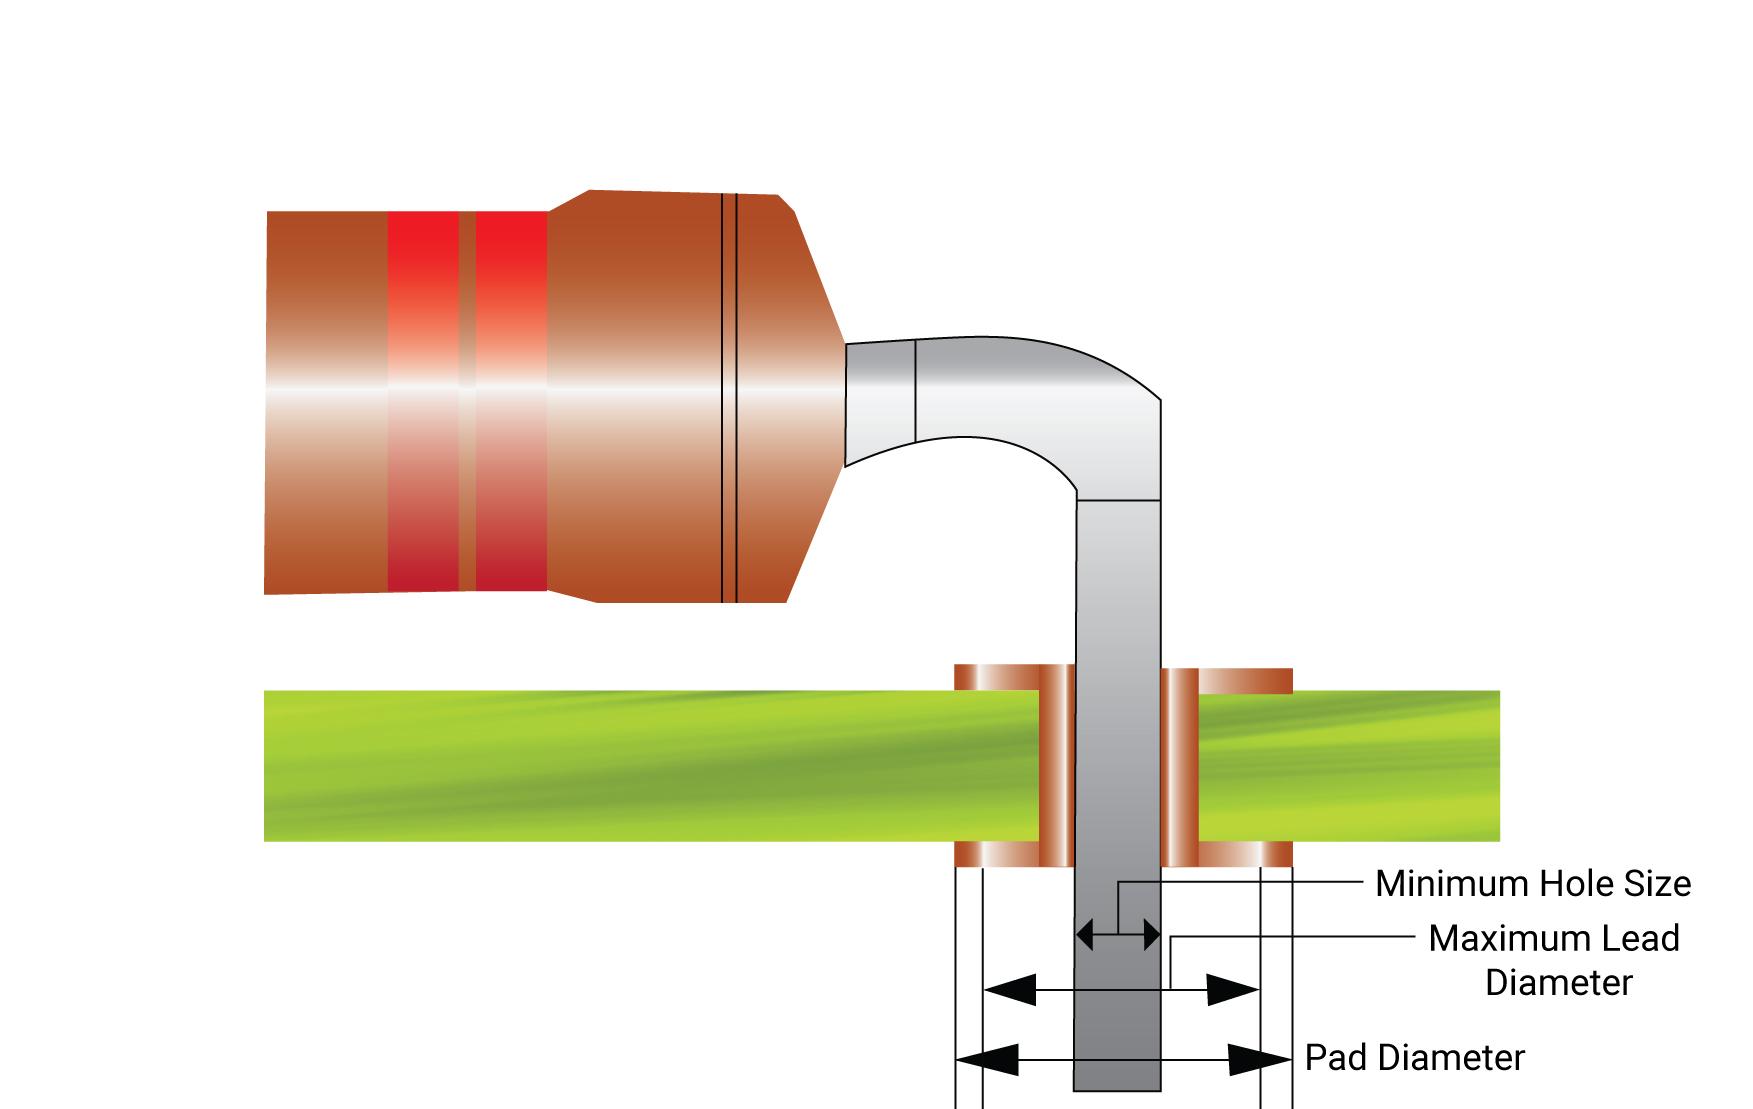 Minimum hole size for through-hole leads